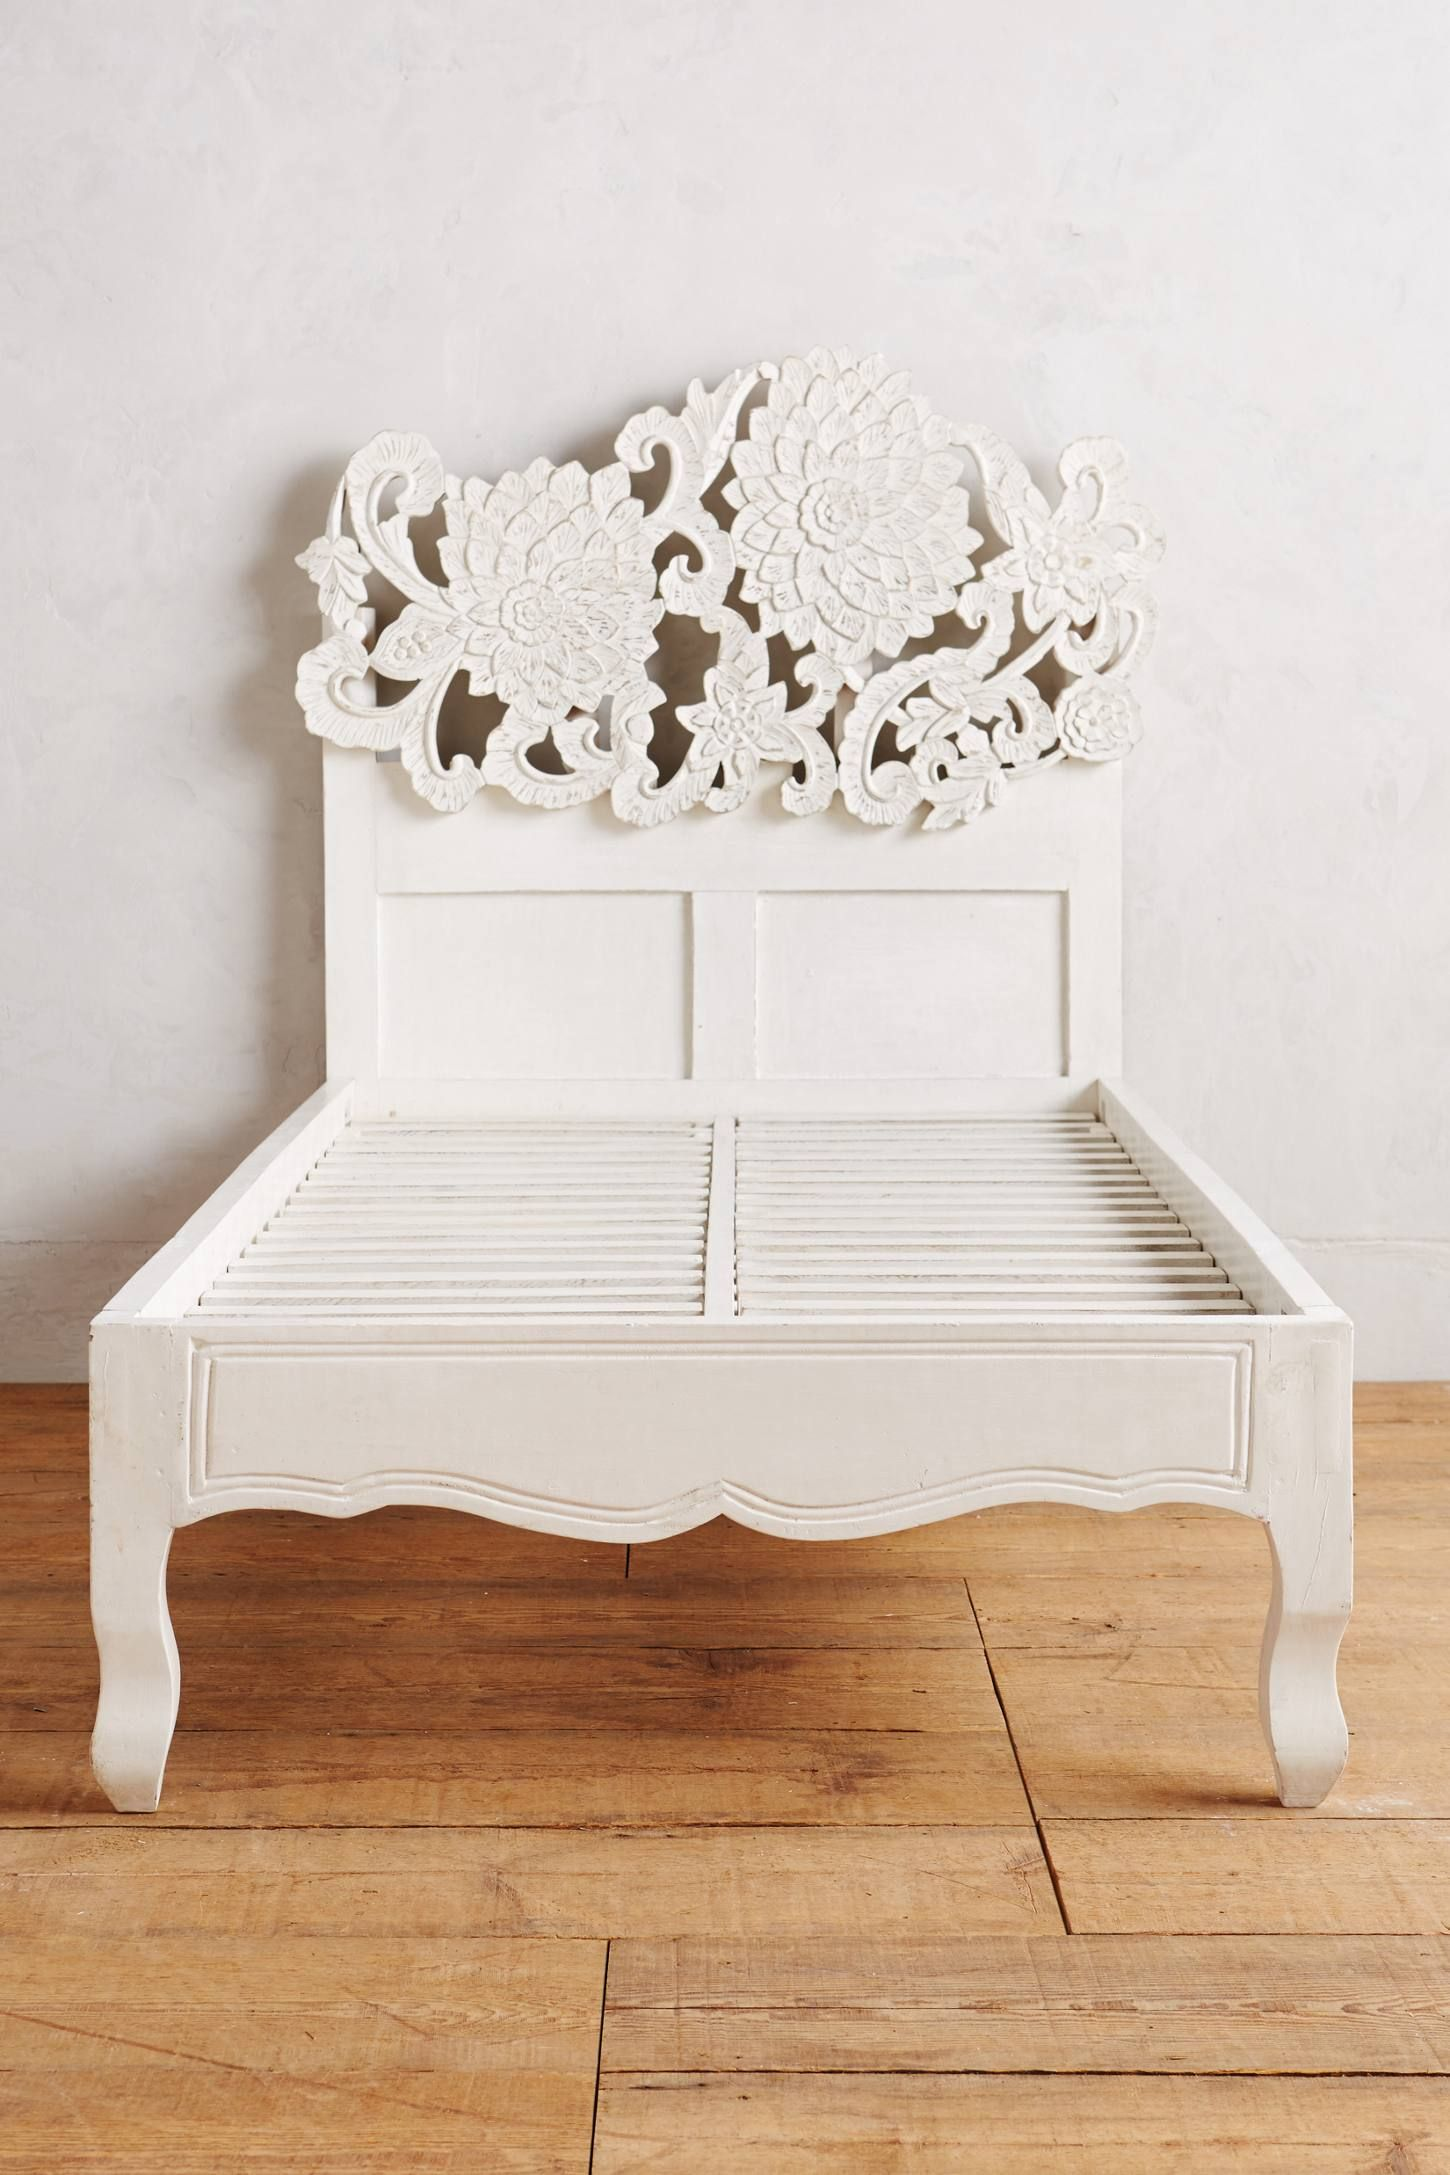 Handcarved Lotus Bed | Bedrooms | Pinterest